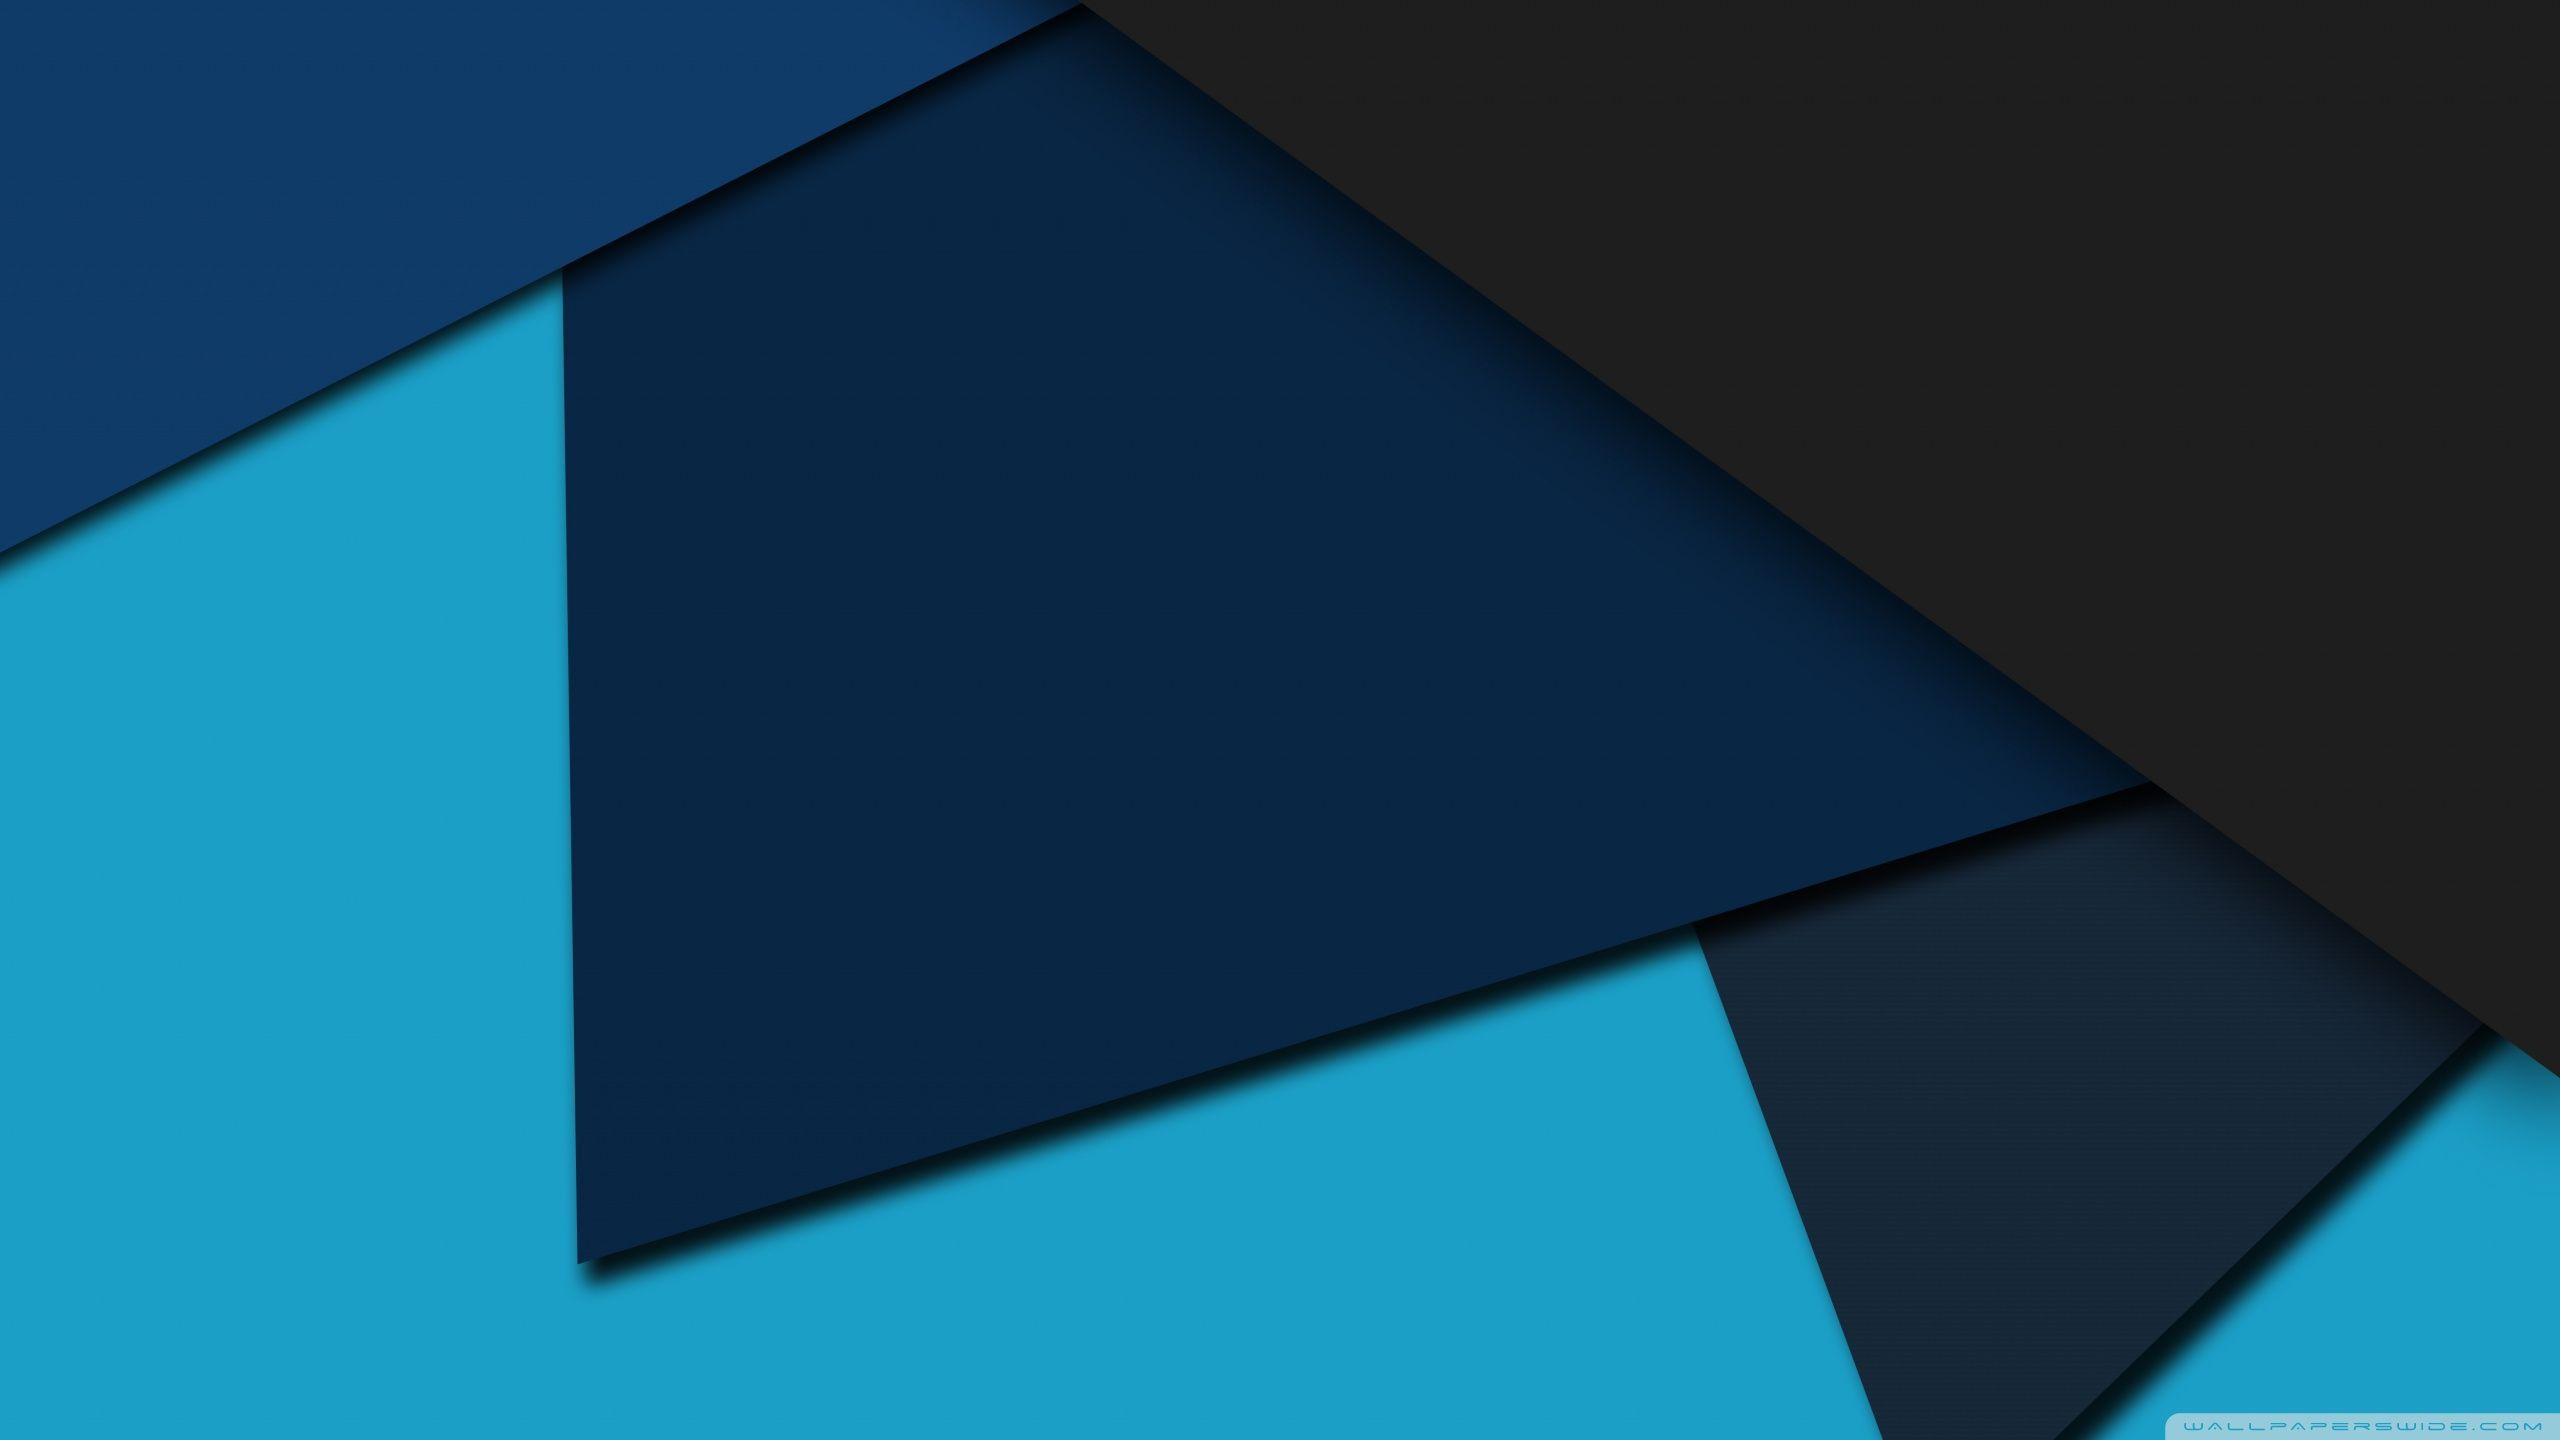 minimalist background hd desktop wallpaper high definition